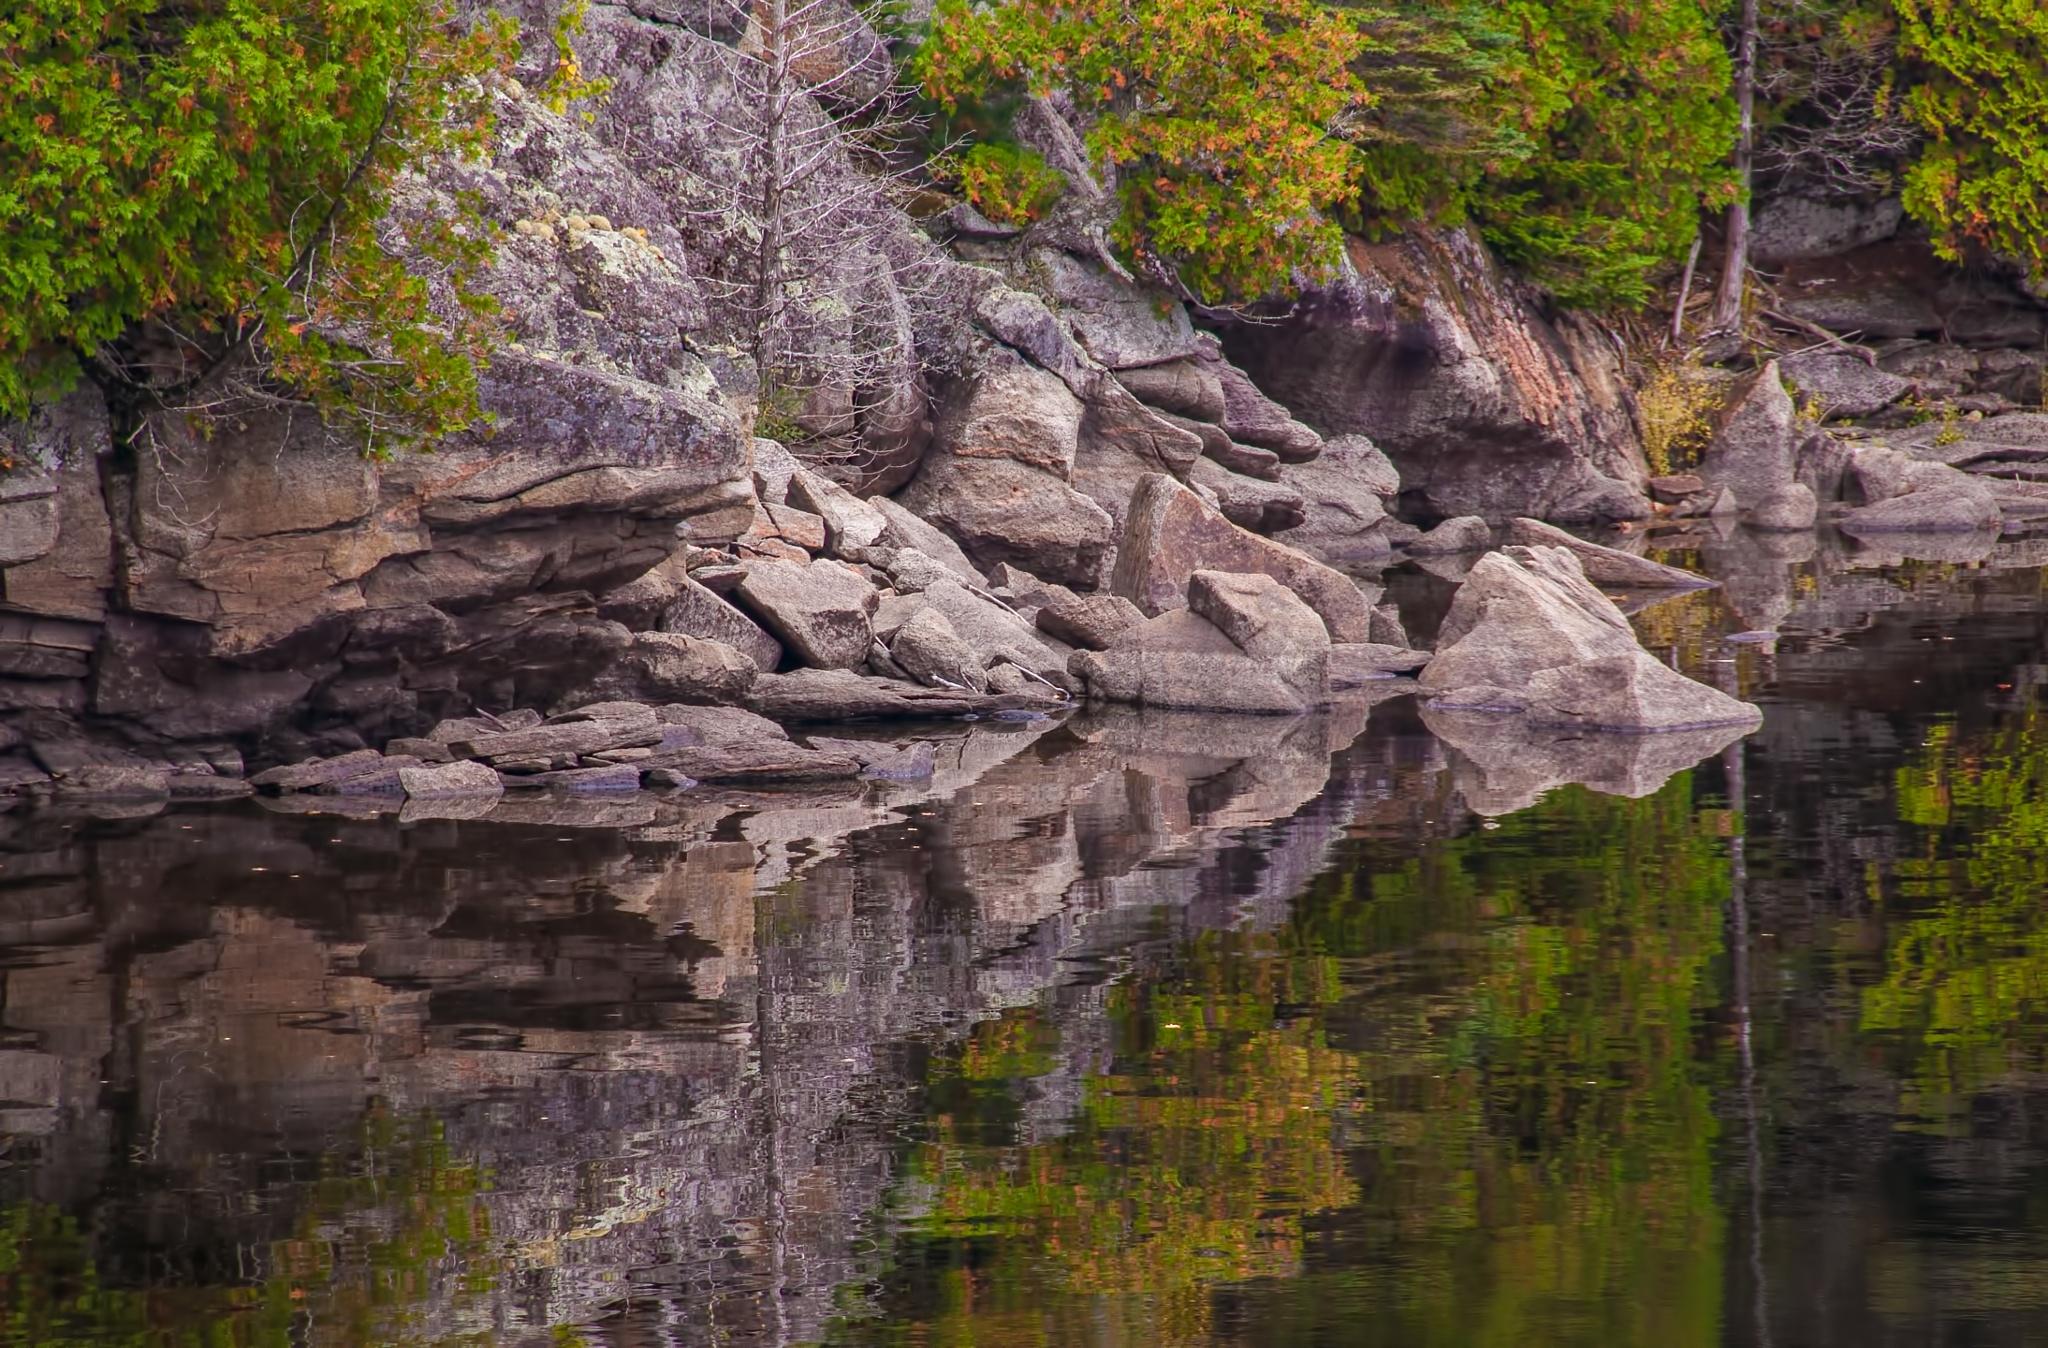 Water's Edge by Bobjb